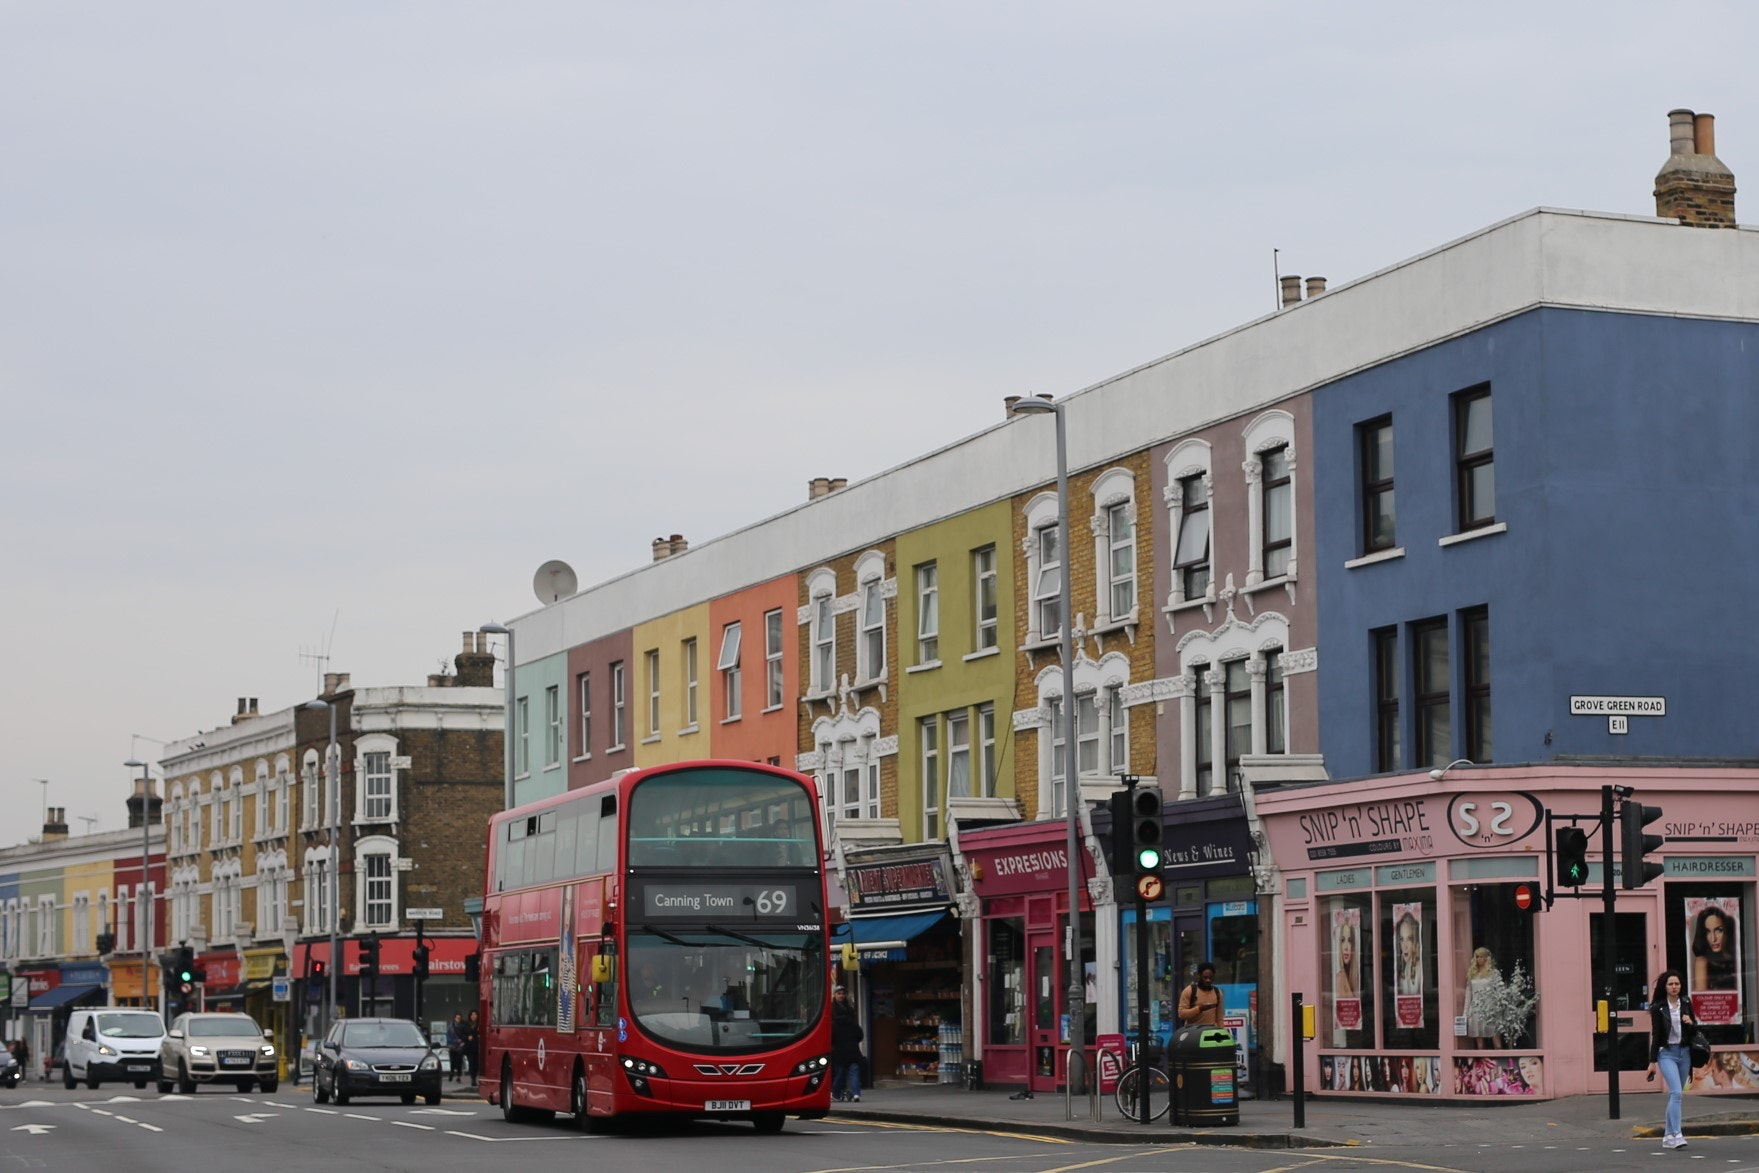 Canning Town, mejores barrios de Londres donde vivir